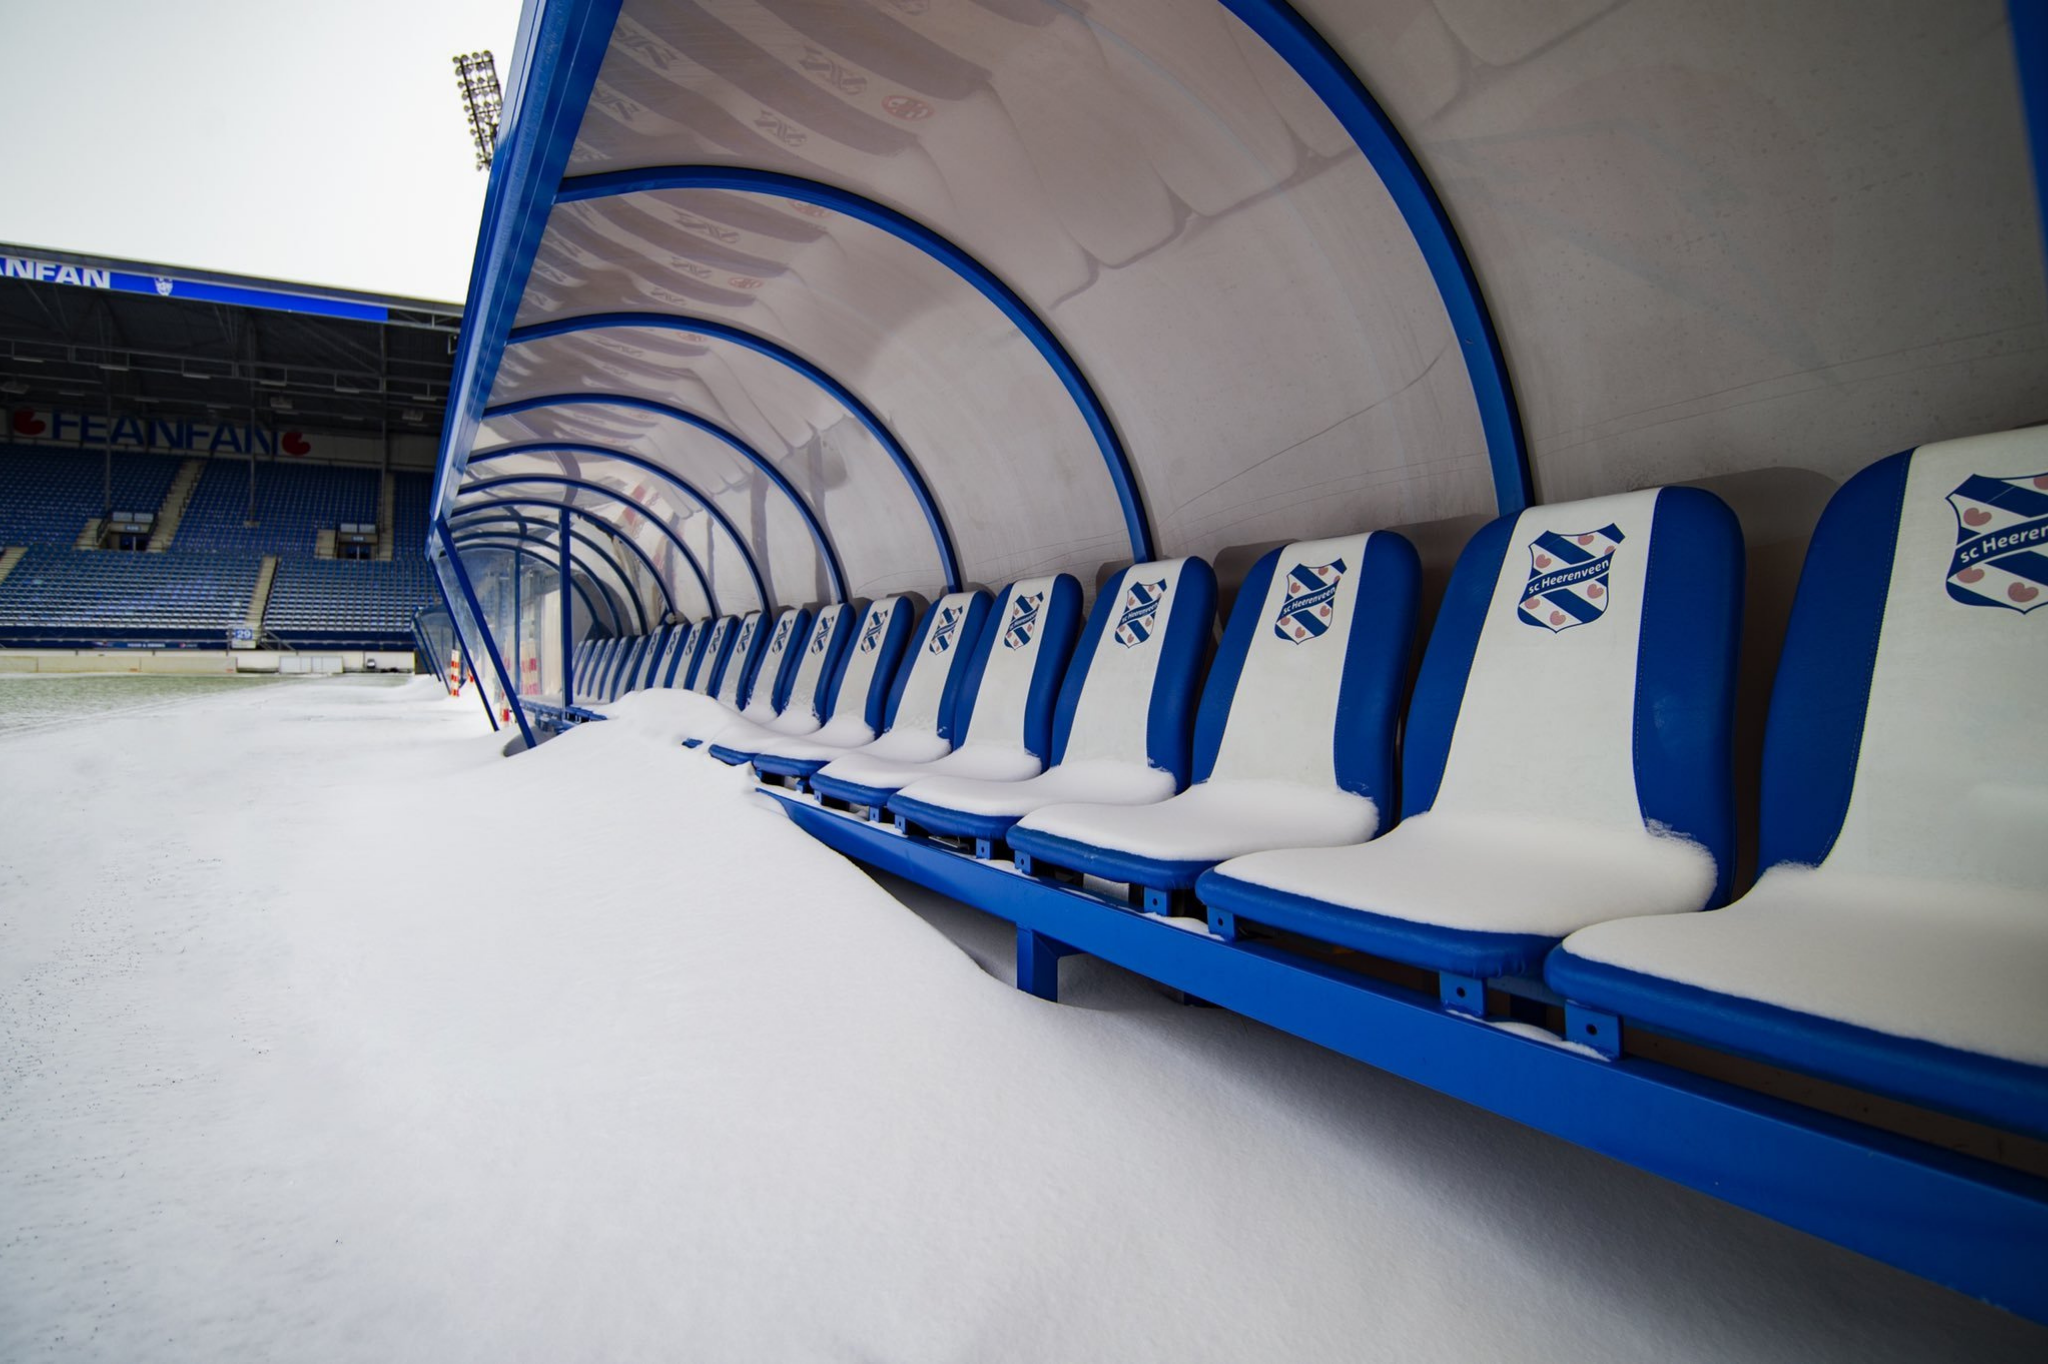 Abe Lenstra Stadion (SC Heerenveen)